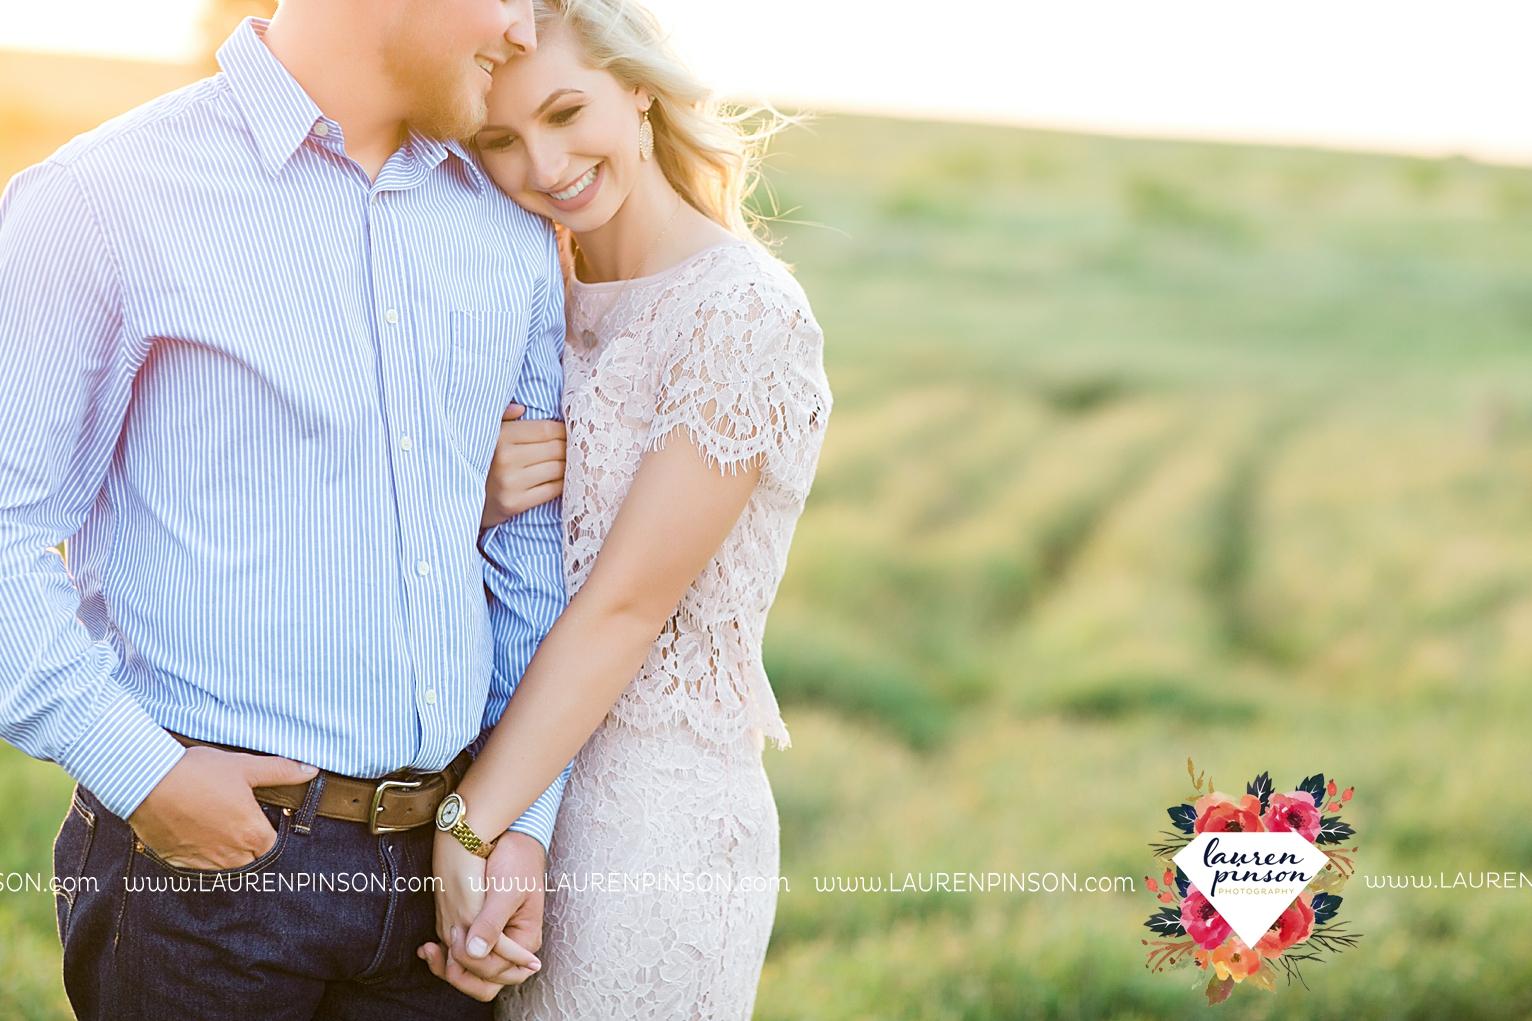 wichita-falls-texas-wedding-photographer-scotland-texas-engagement-session-country-barn-field-windthorst_2768.jpg